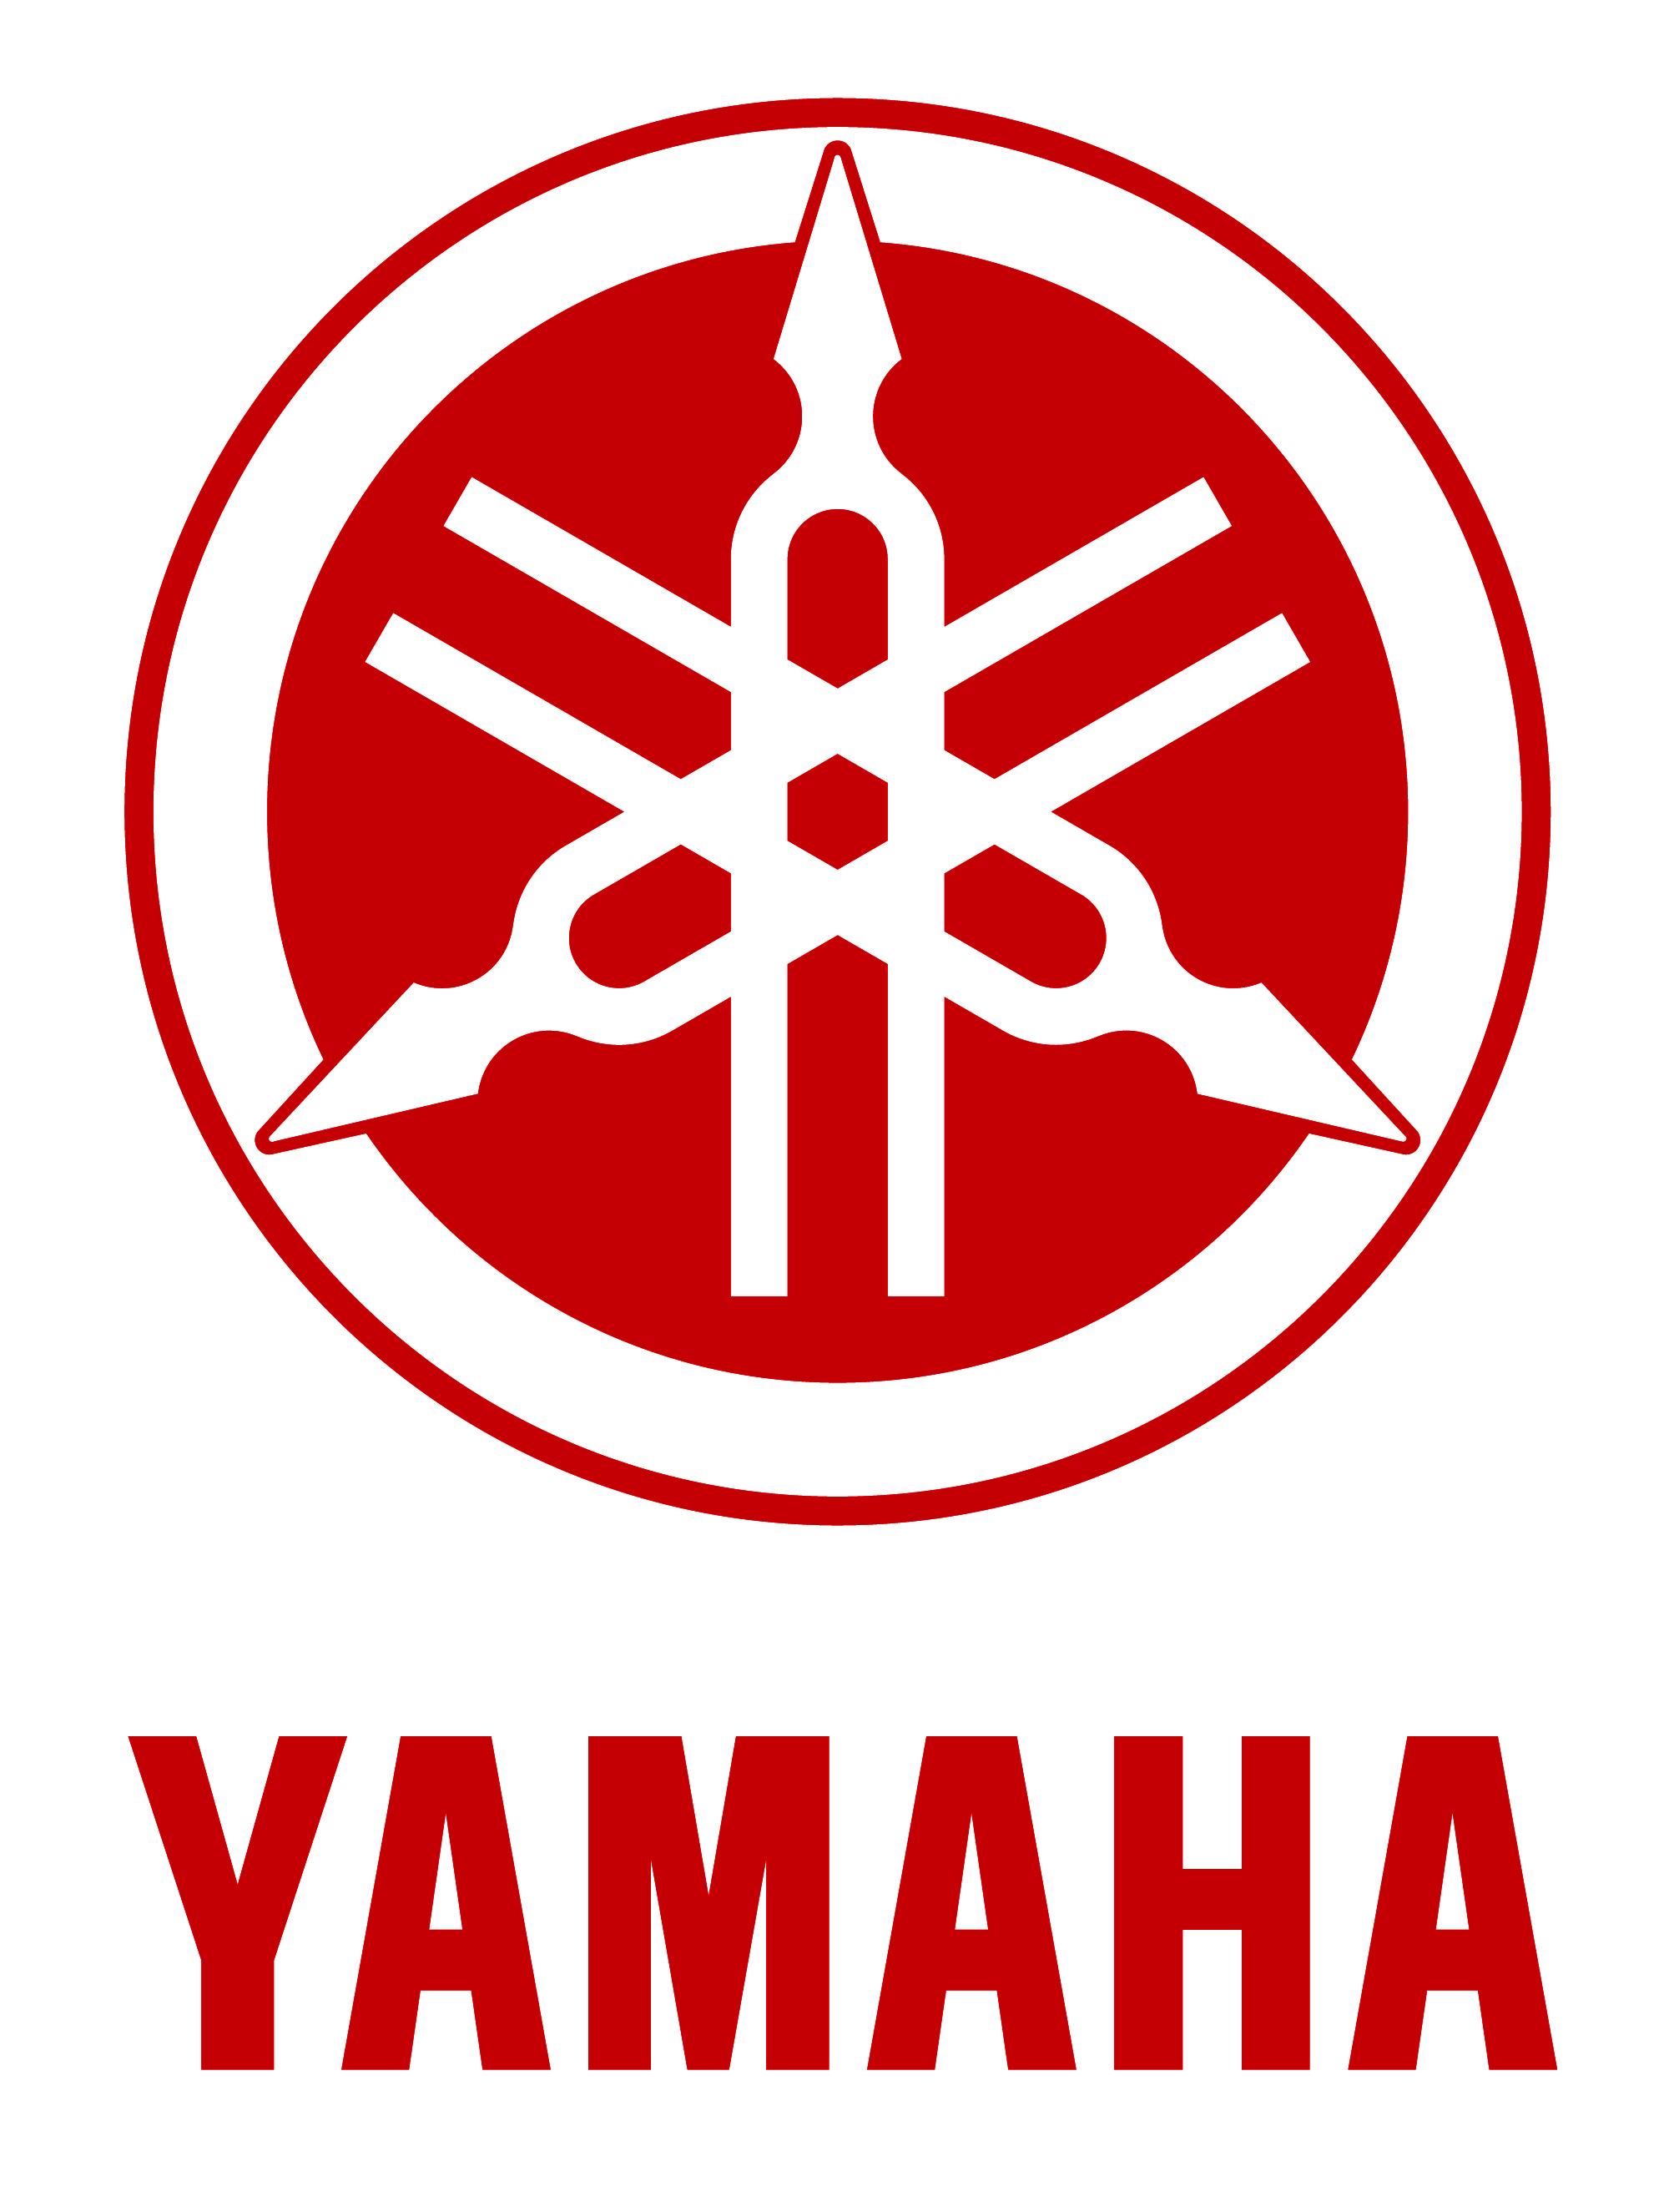 yamaha motorcycle wiki fandom powered by wikia